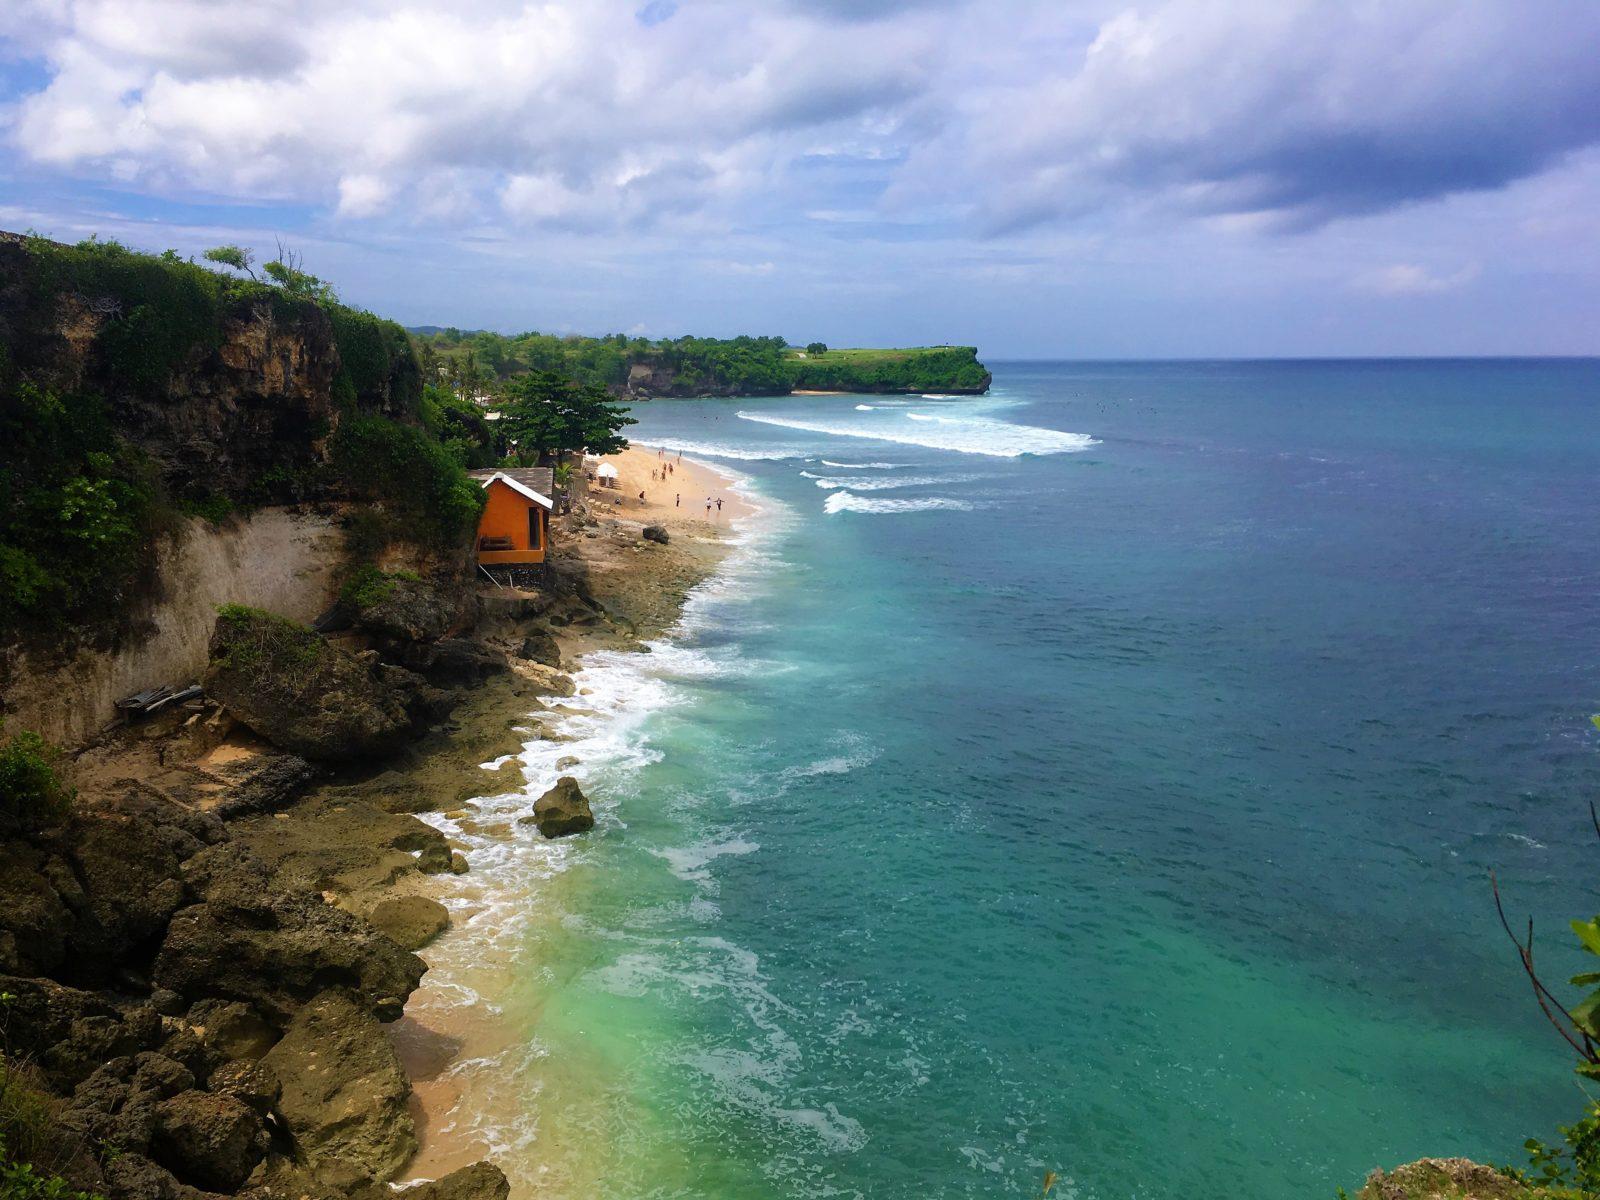 bali legjobb strandjai tengerpartjai szörf surf balangan dreamland bingin uluwatu nusa dua